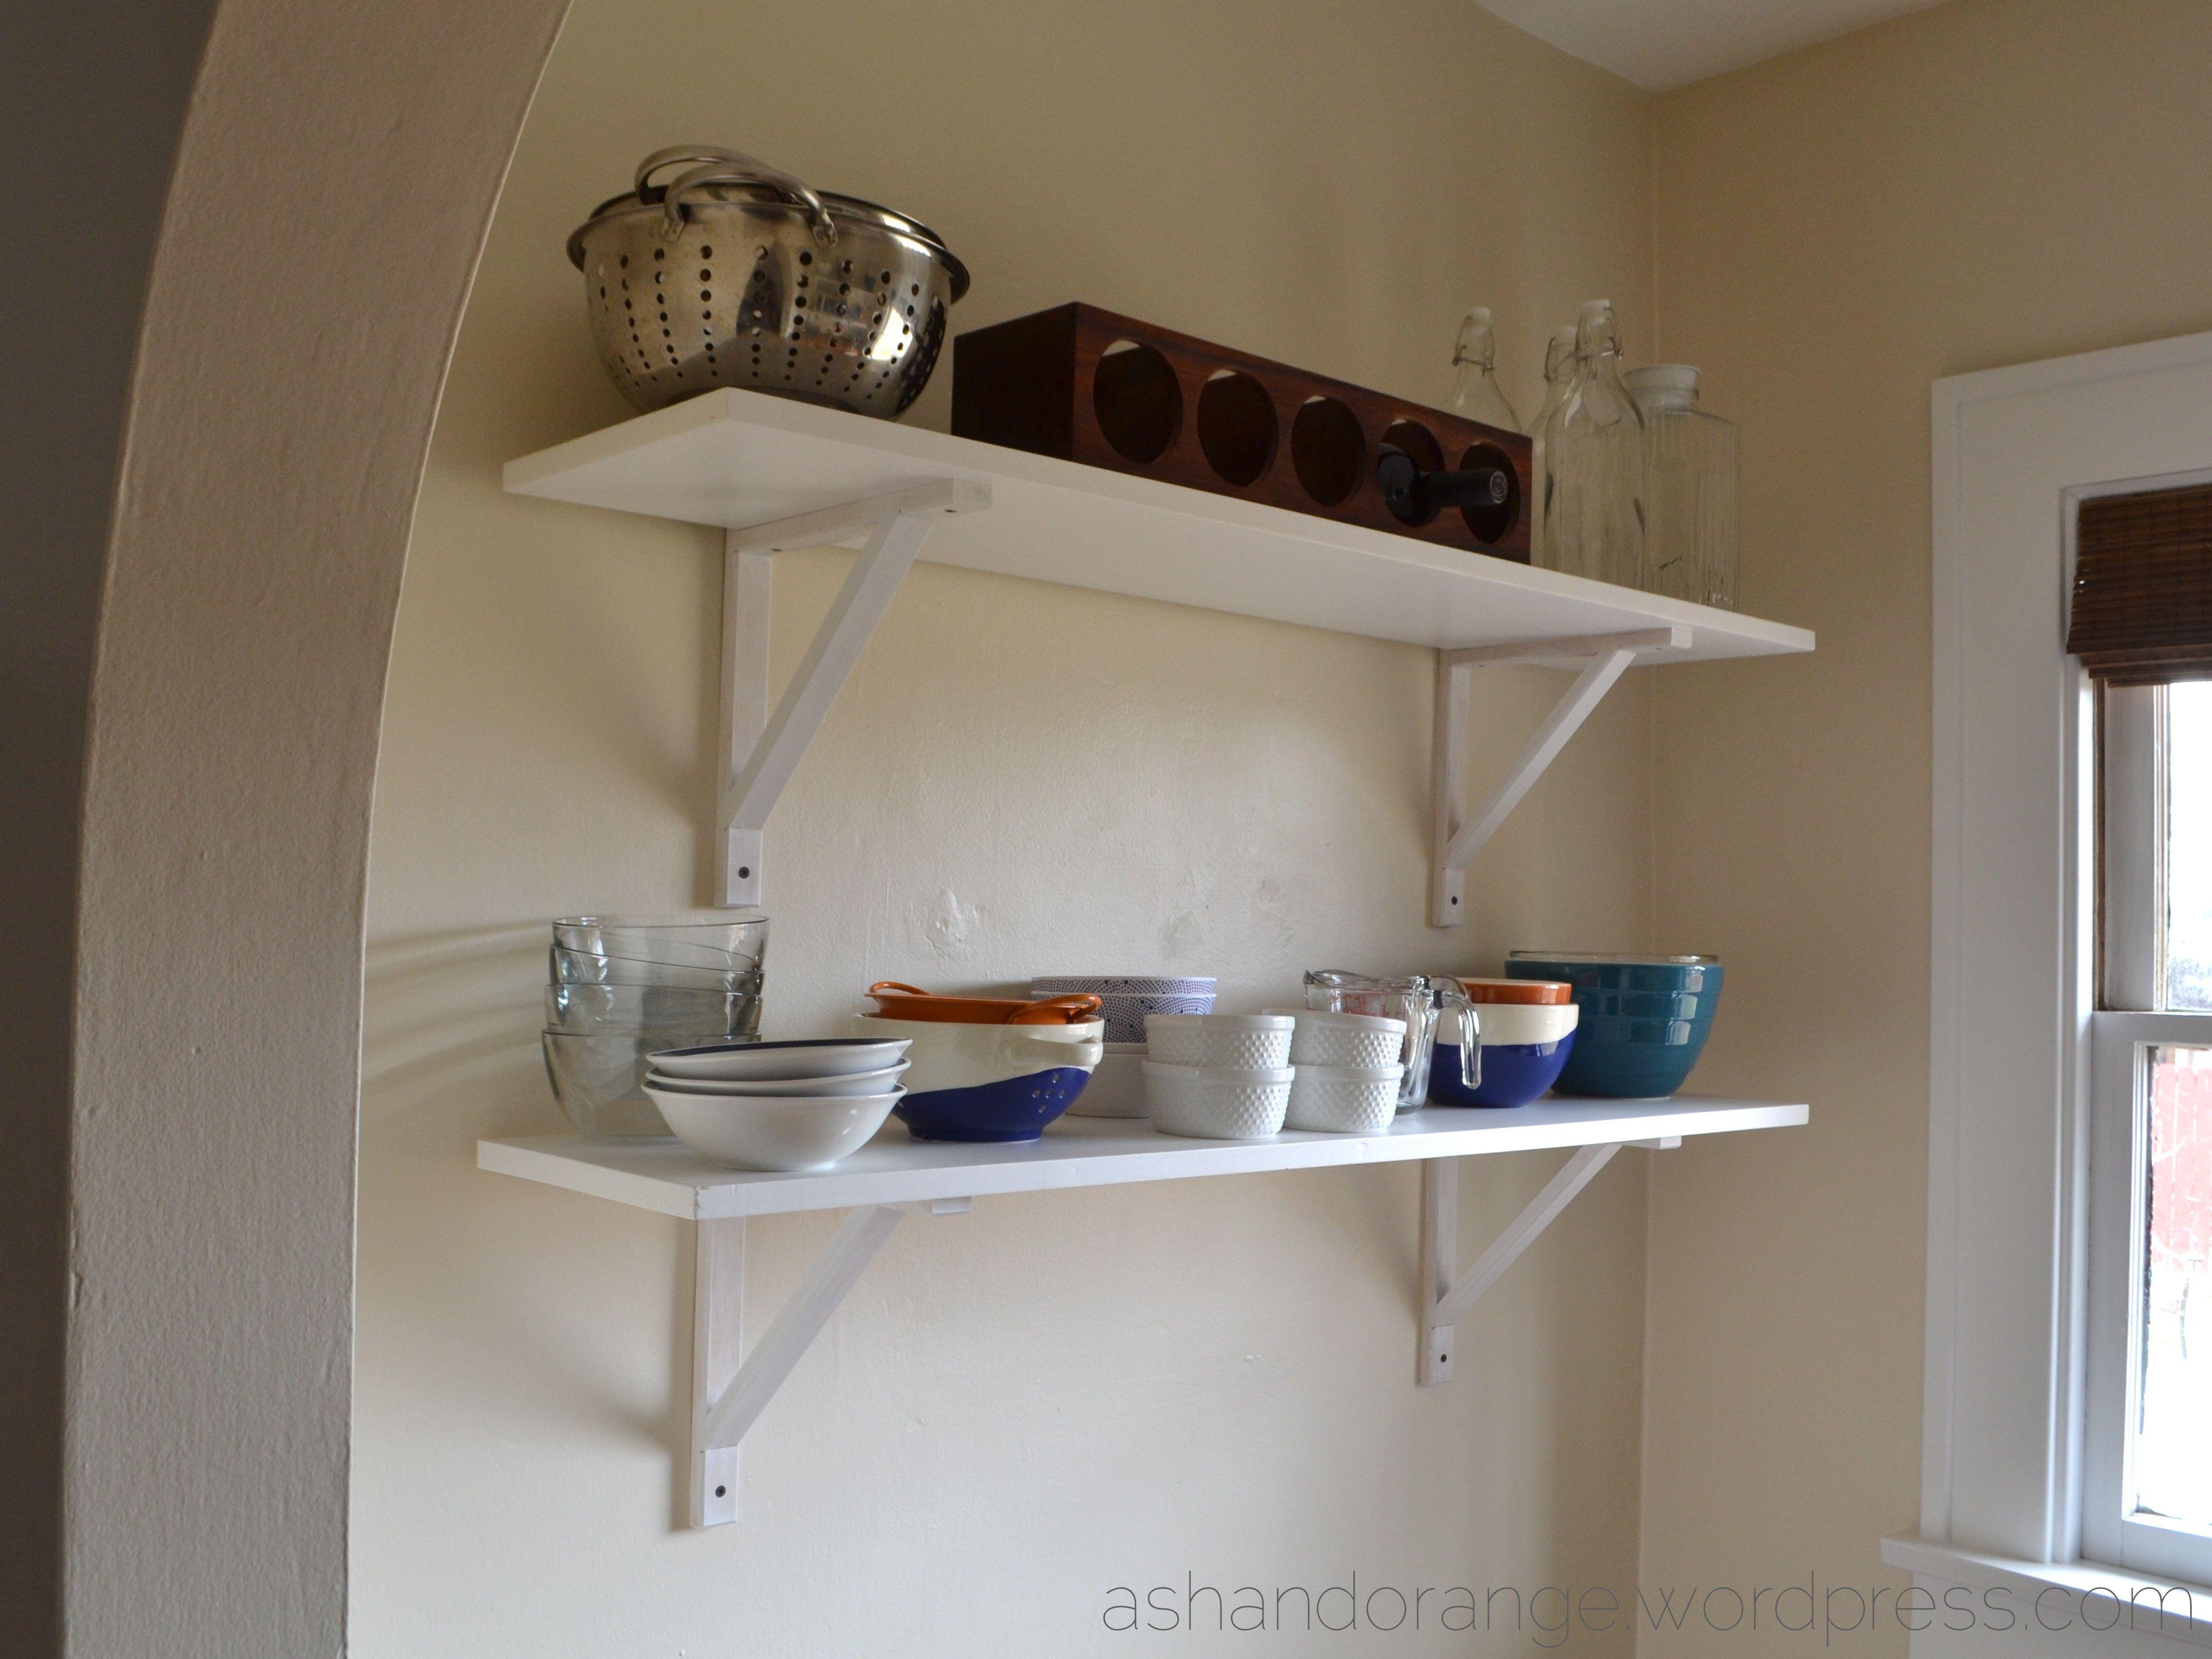 Kitchen Nook Open Shelves Ashandorange.wordpress.com